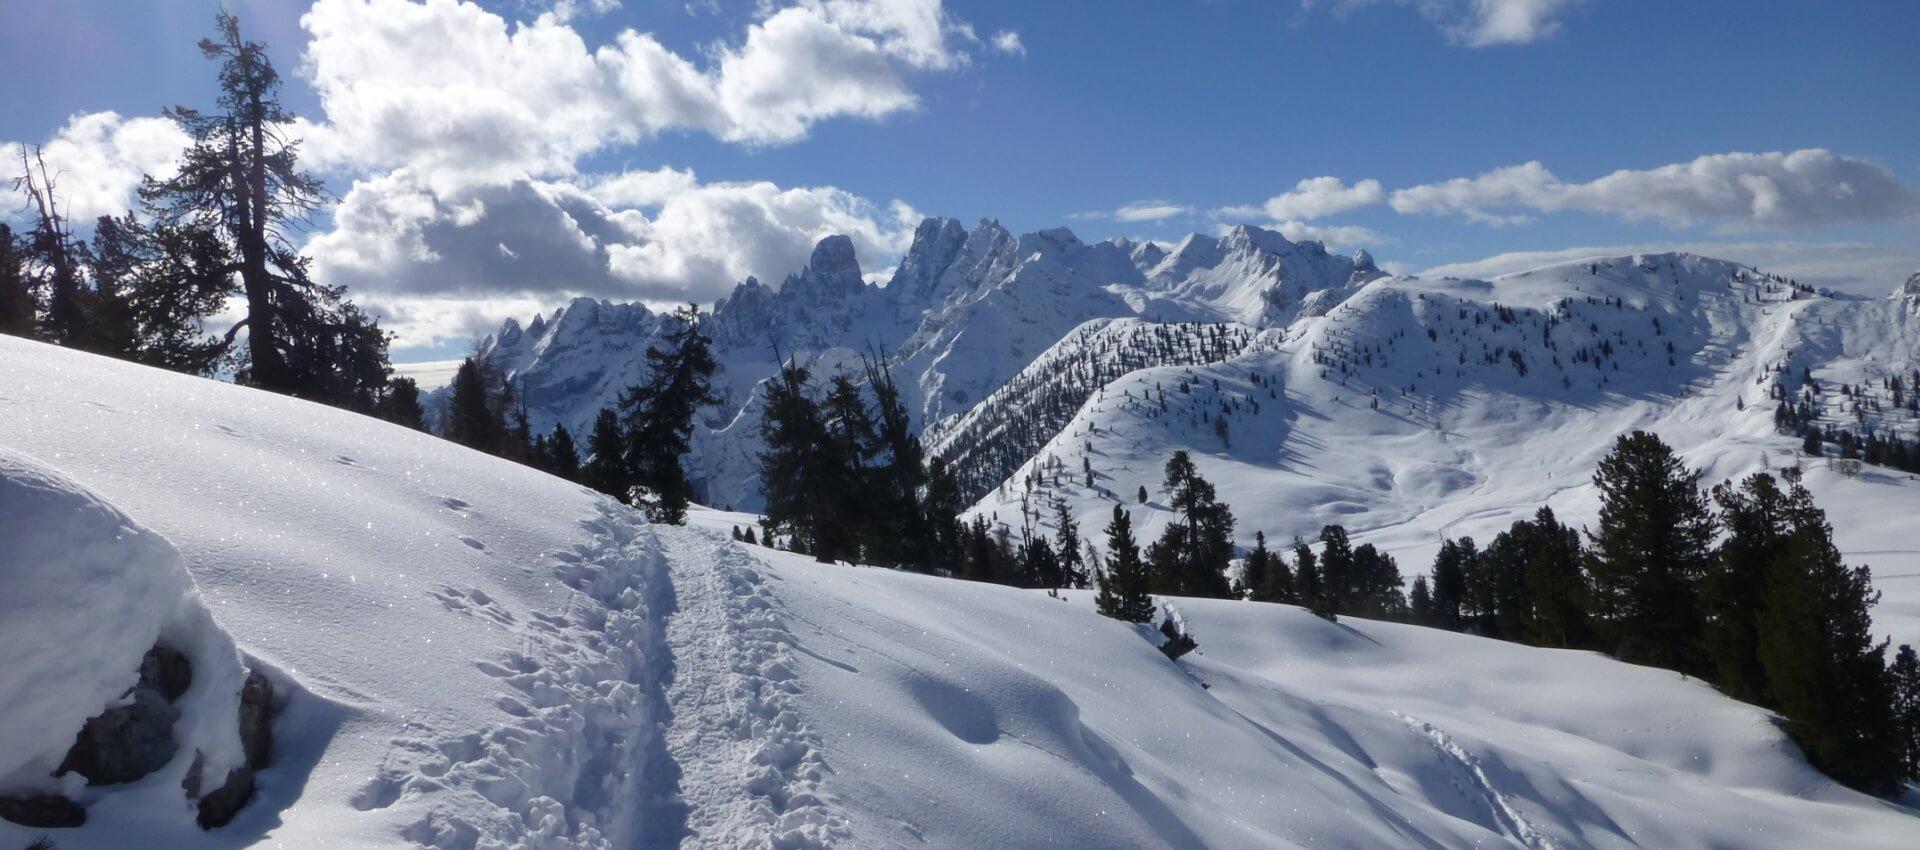 bergfrische-winter-01